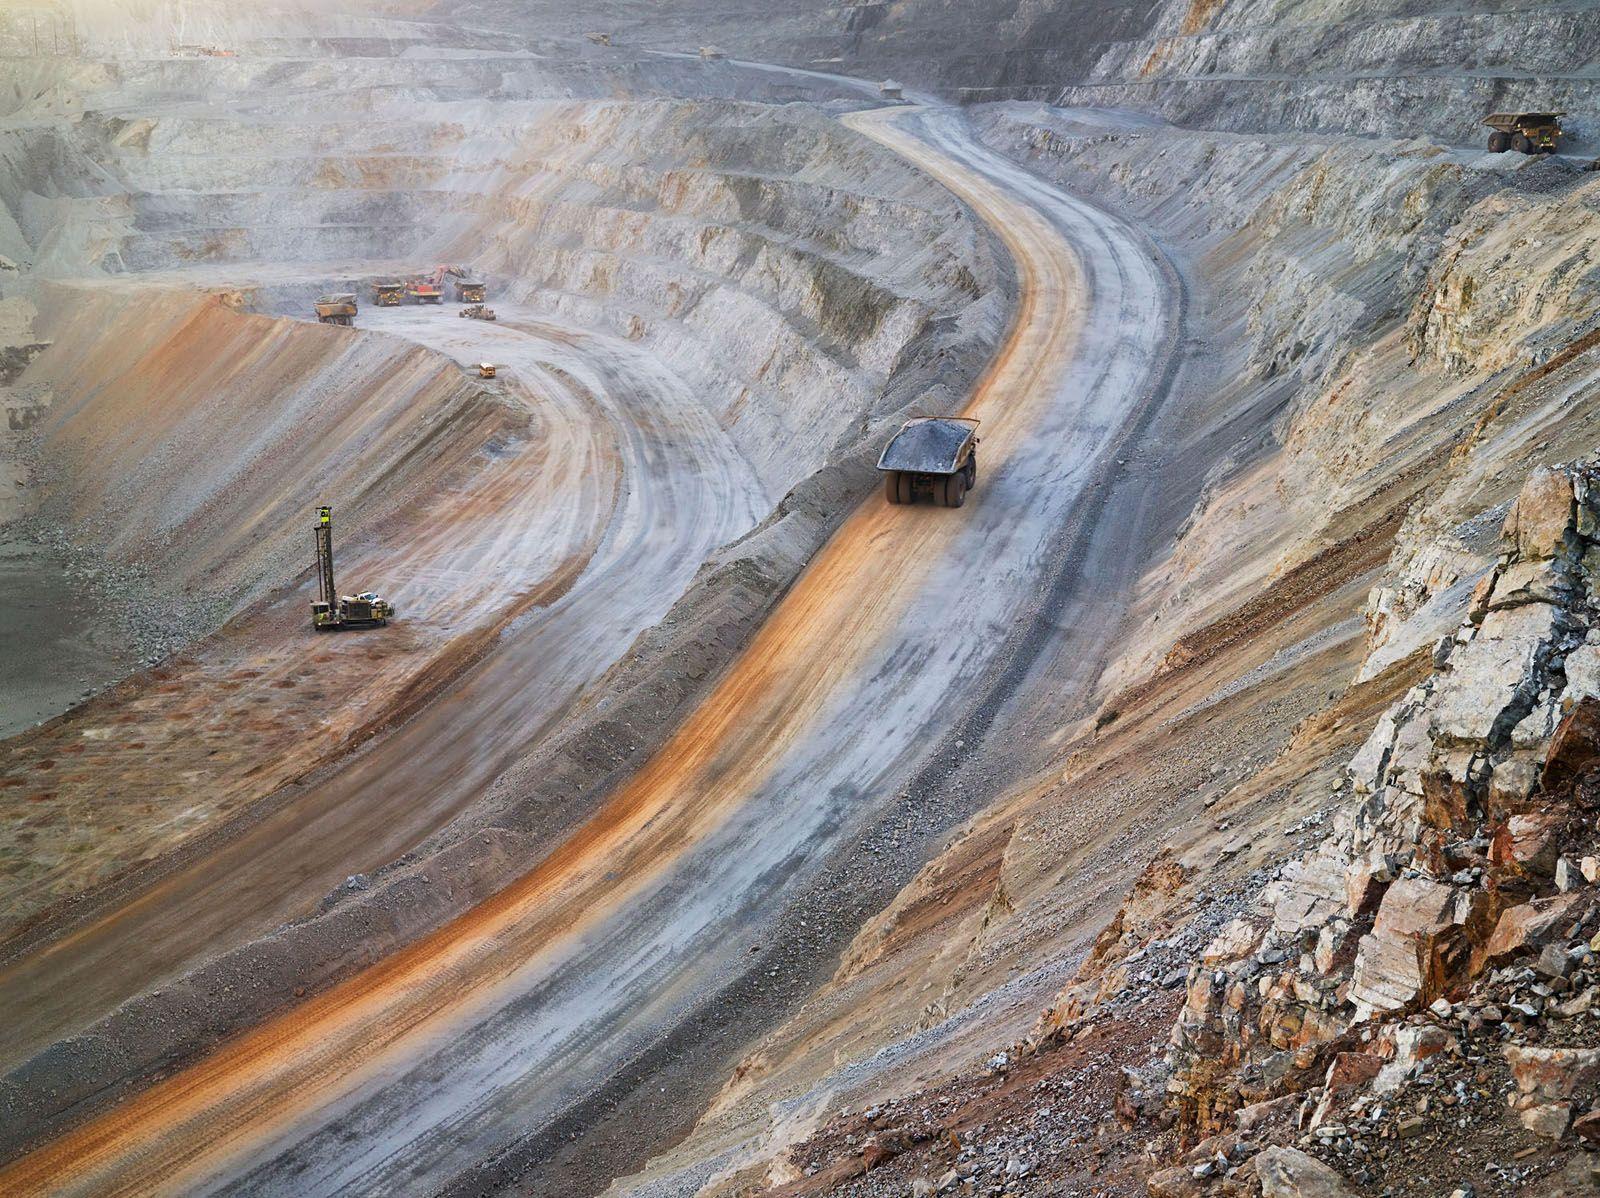 LUCAS FOGLIA, Surface Mining, Newmont Mining Corporation, Carlin, Nevada, 2012